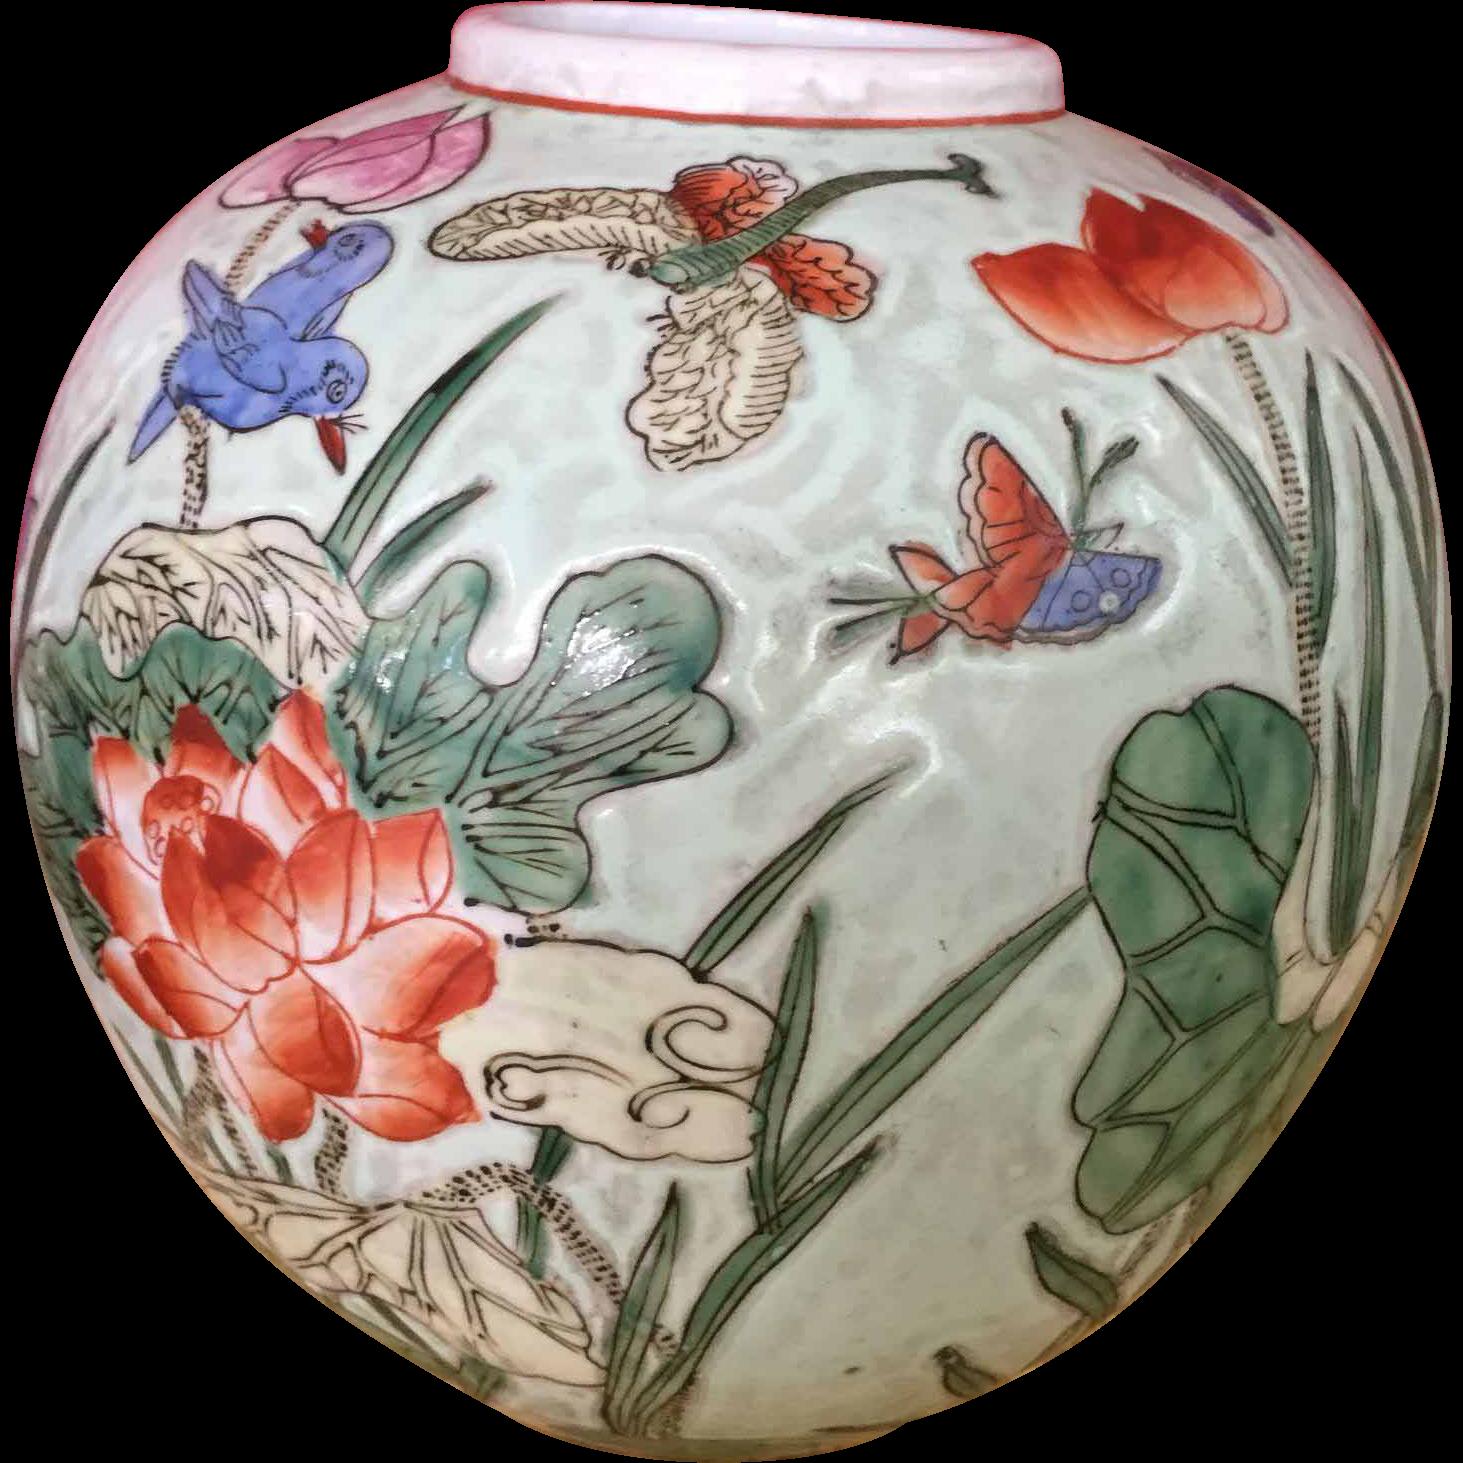 Chinese Ginger Jars Vintage Porcelain Chinese Ginger Jar Vase Macau Pottery